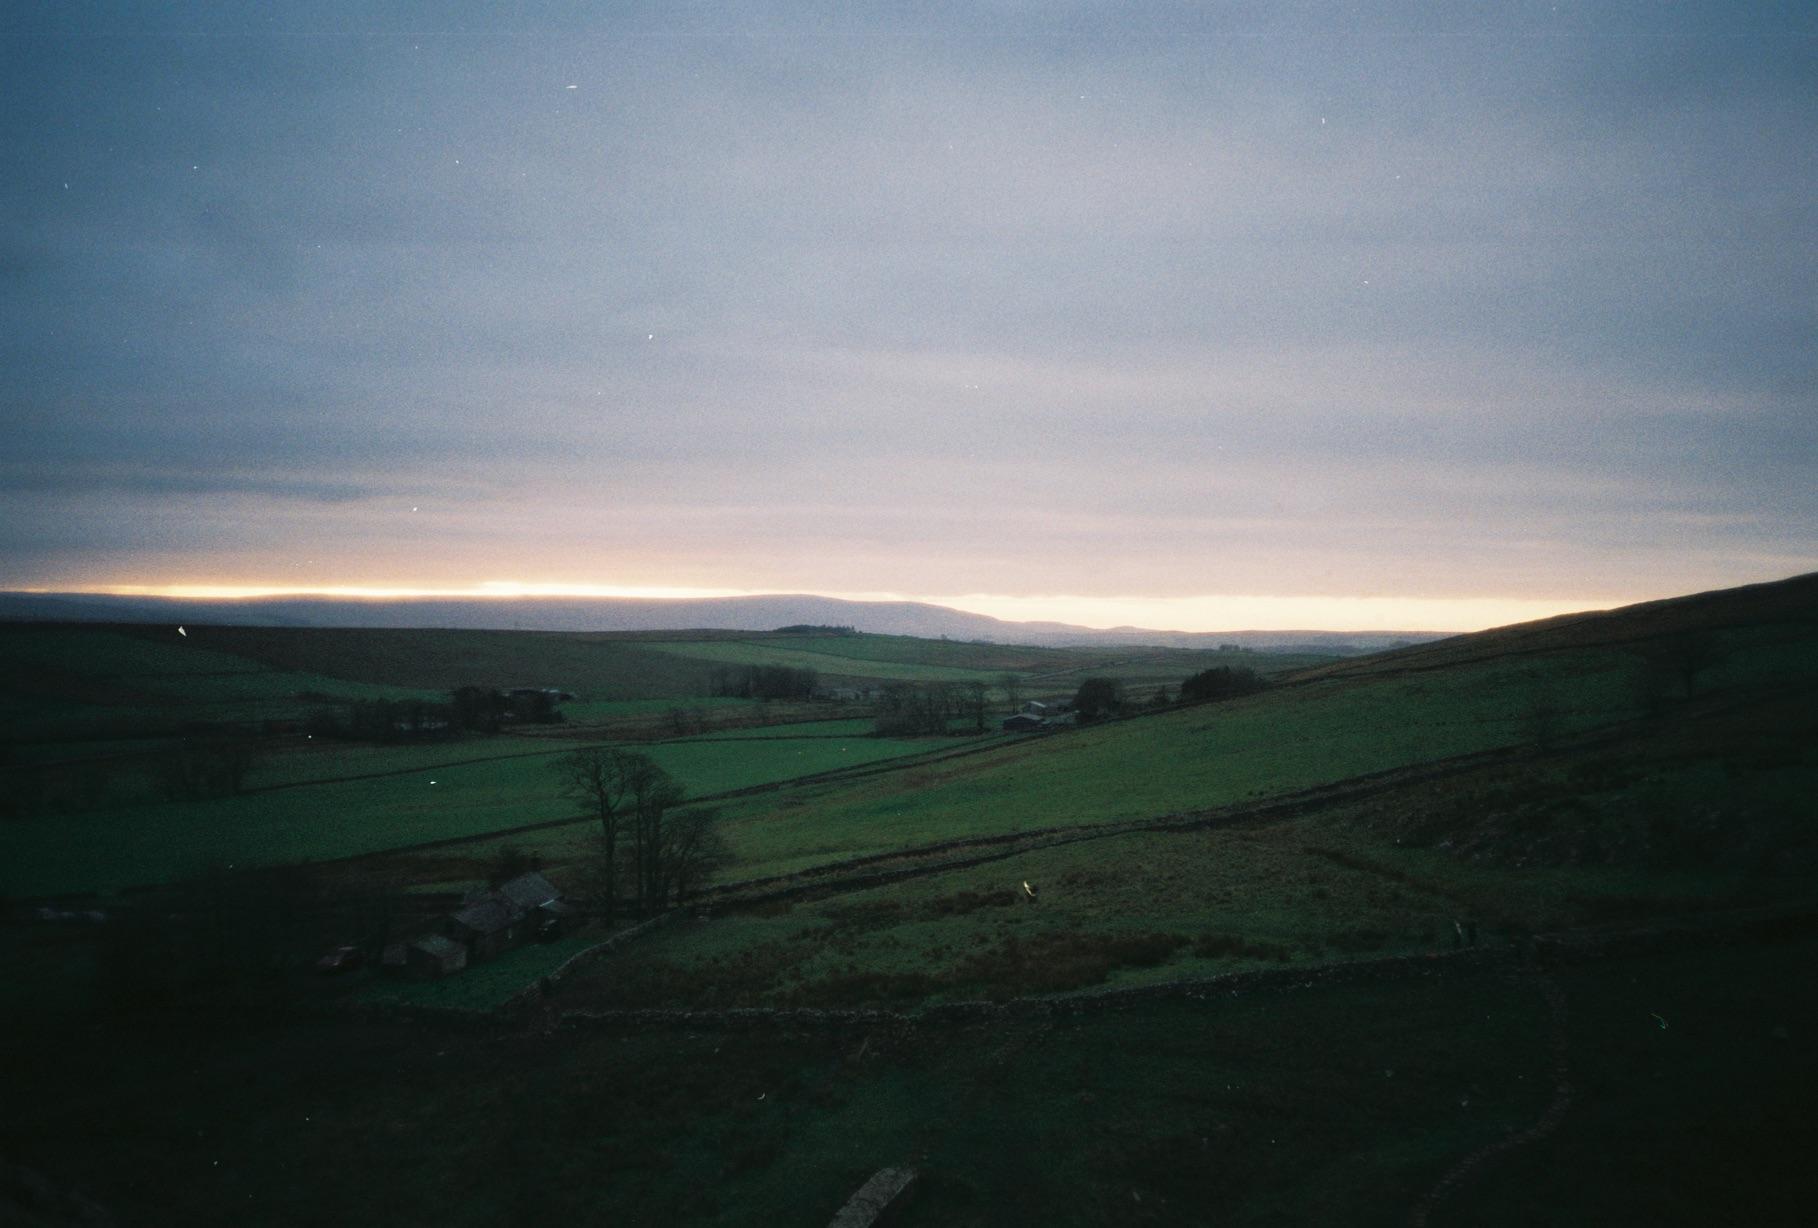 hadrian's wall / yorkshire